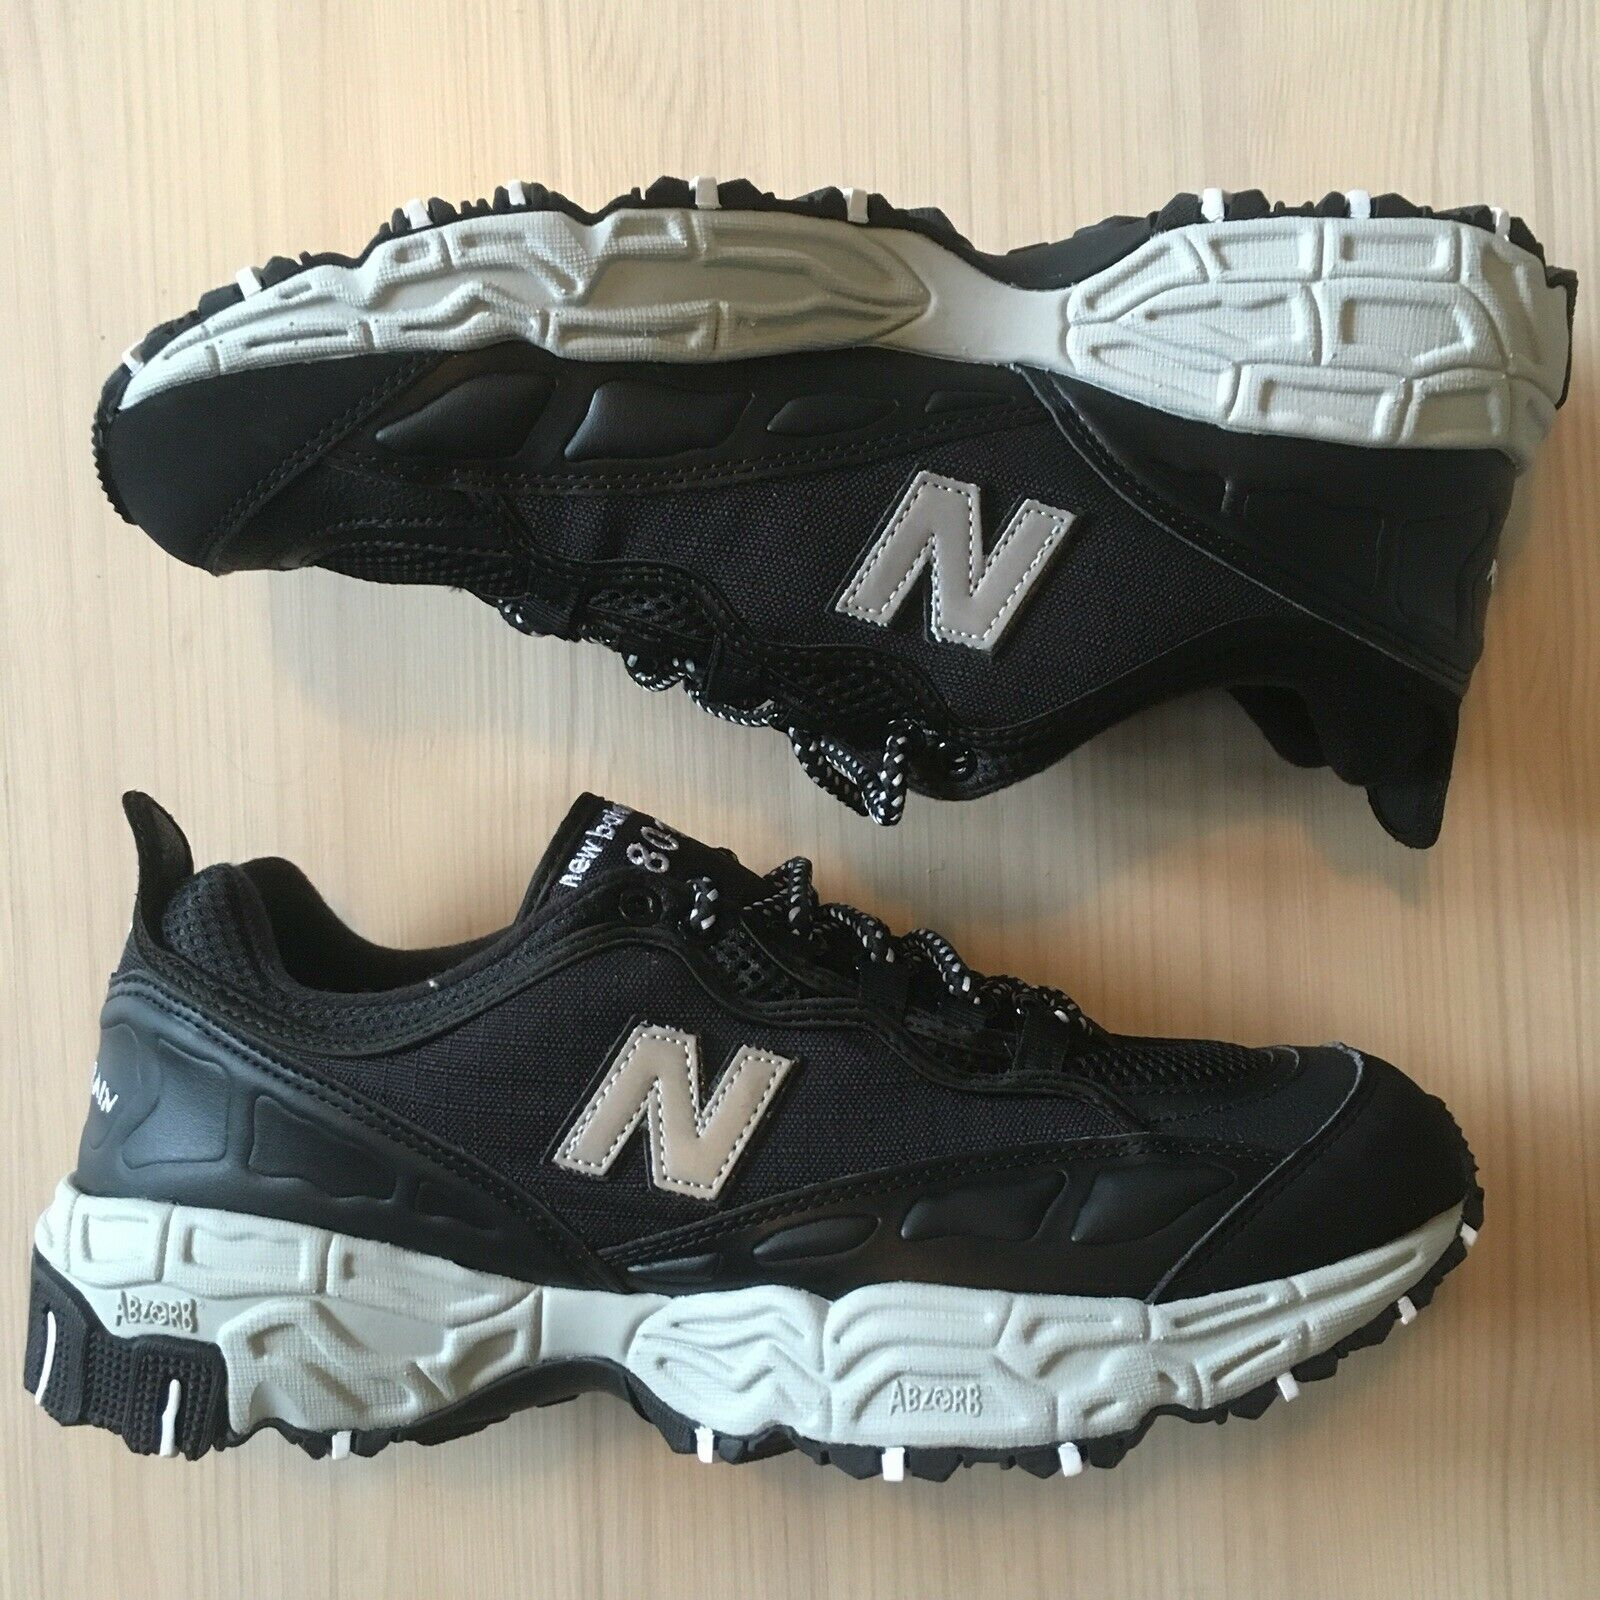 New Balance 801 All Terrain Hiking Shoe Mens Size 11 Black/grey Brand New